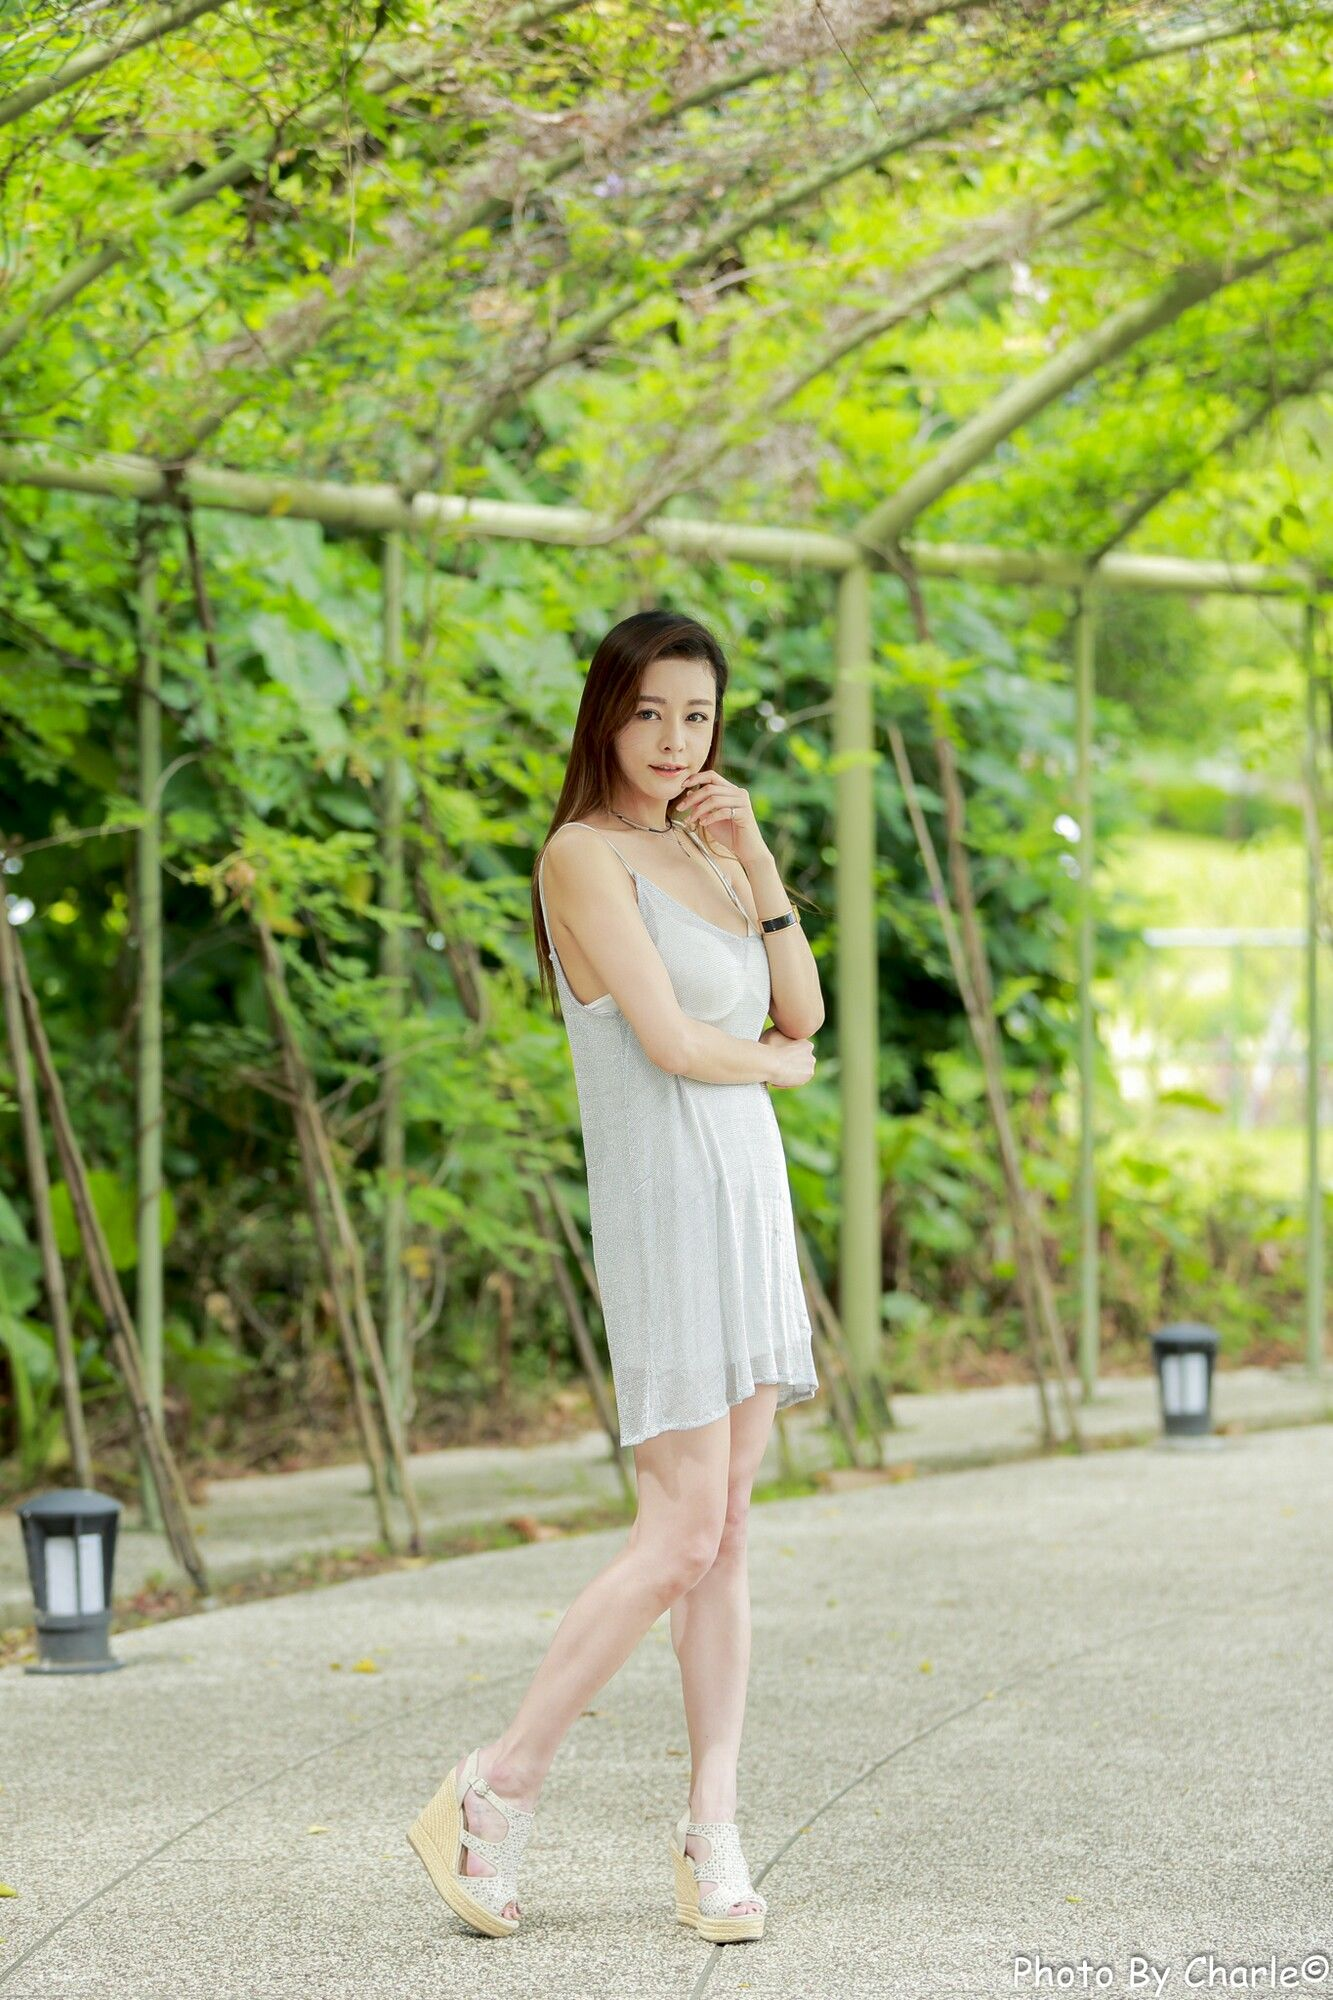 VOL.1158 [台湾正妹]清新唯美养眼优雅美女长发美女:韩羽超高清个人性感漂亮大图(100P)